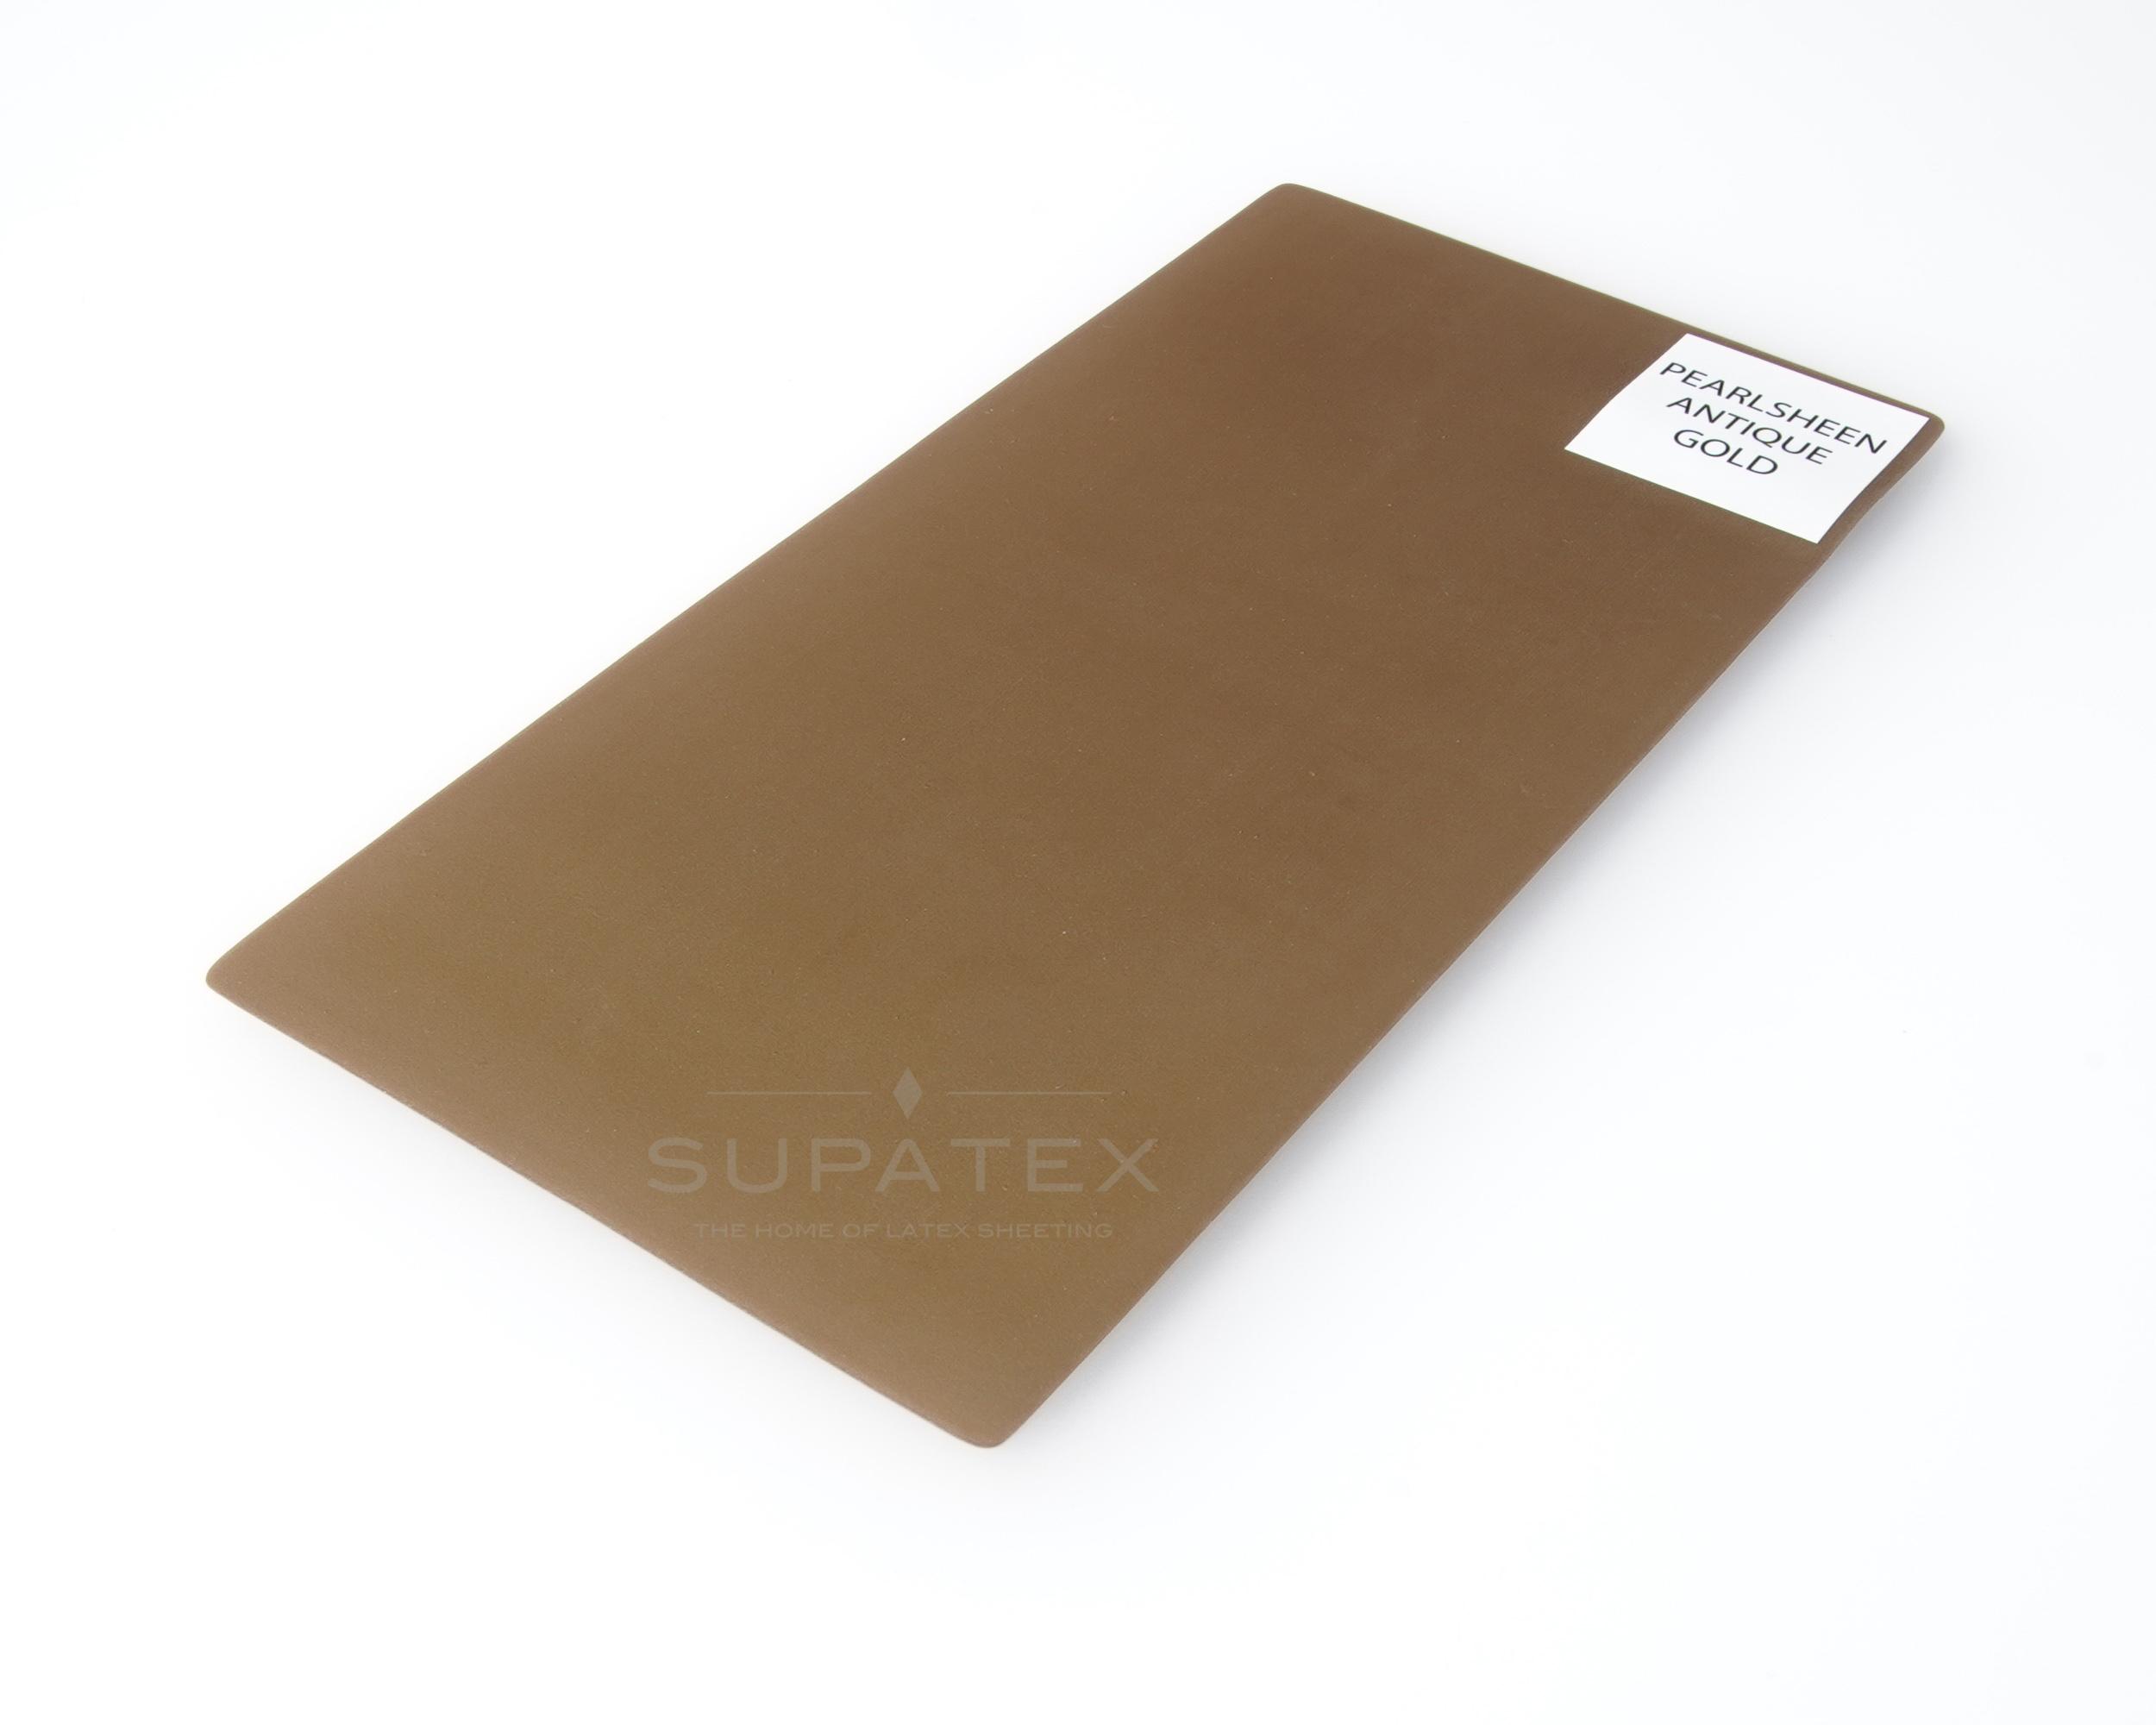 Supatex Pearlsheen Antique Gold 0.33 mm